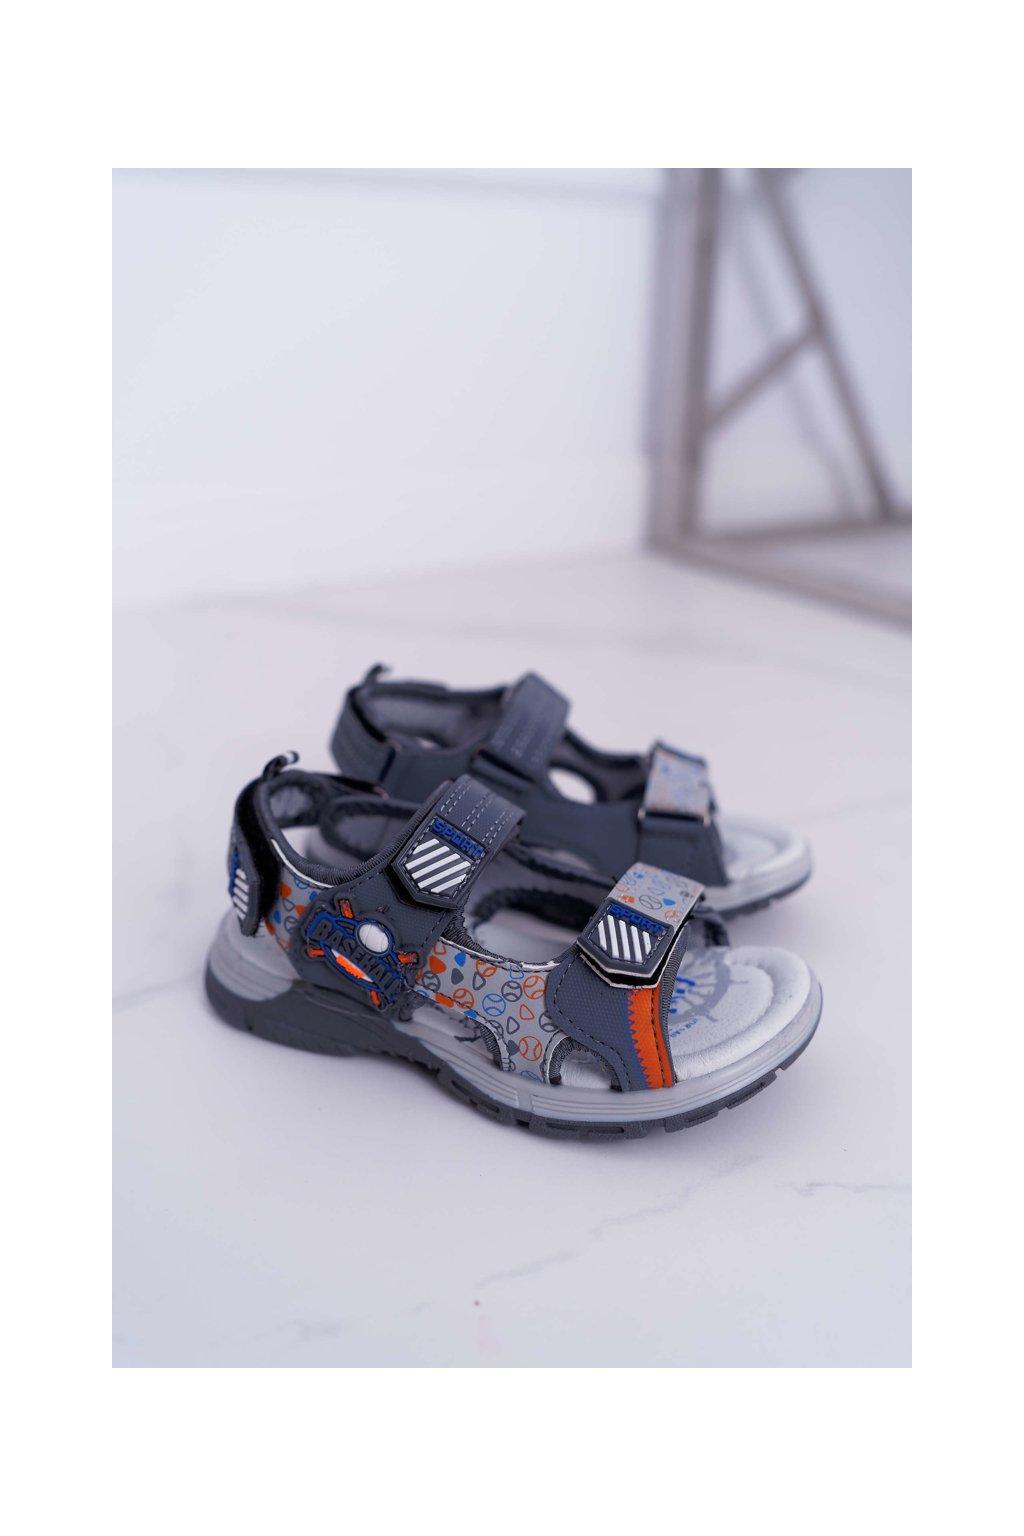 Detské chlapčenské Sandále na suchý zips sivé Reksio